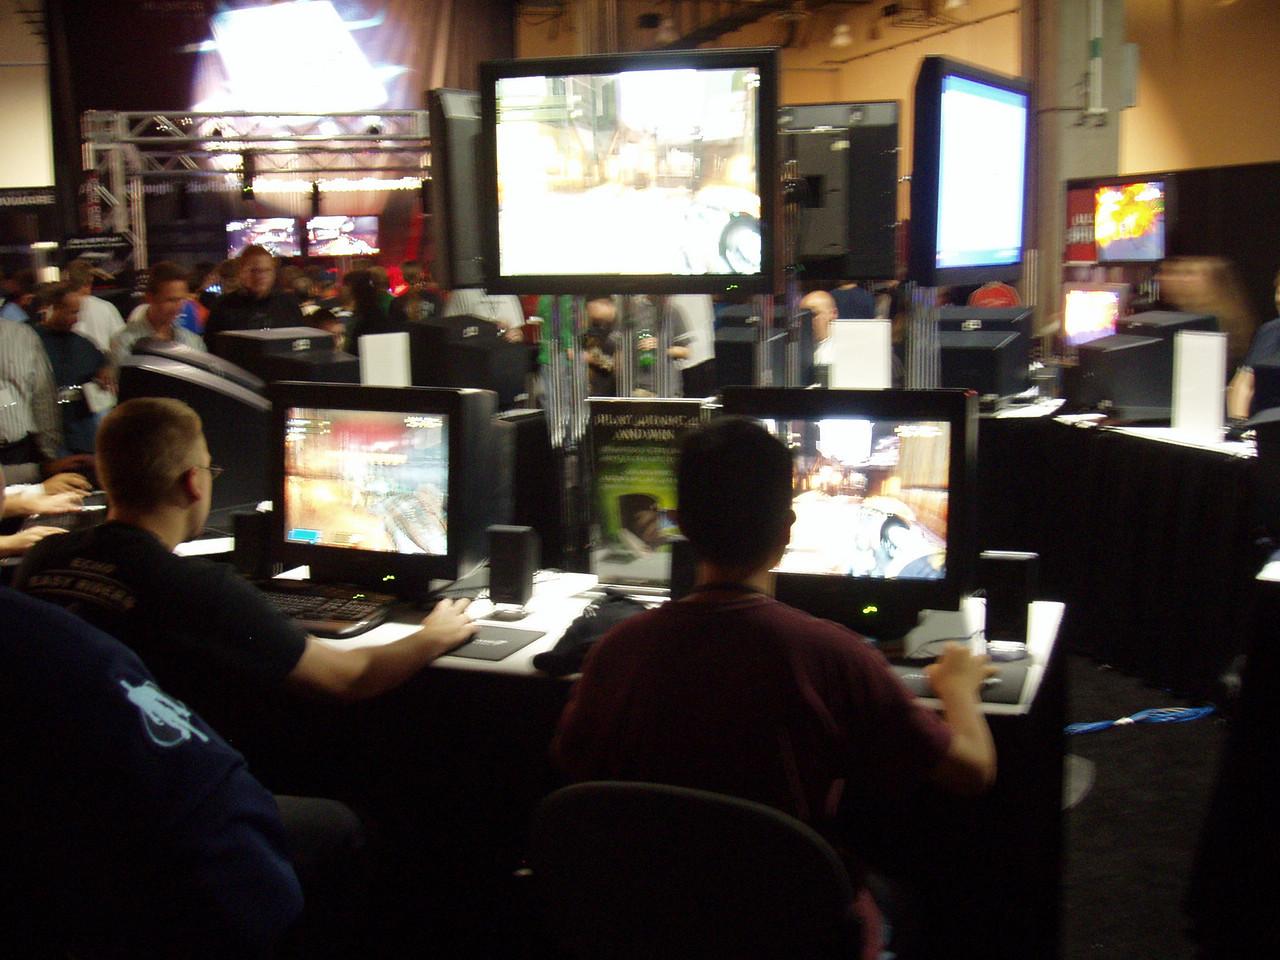 Qcon Day 1 Quake 4 Activision Booth